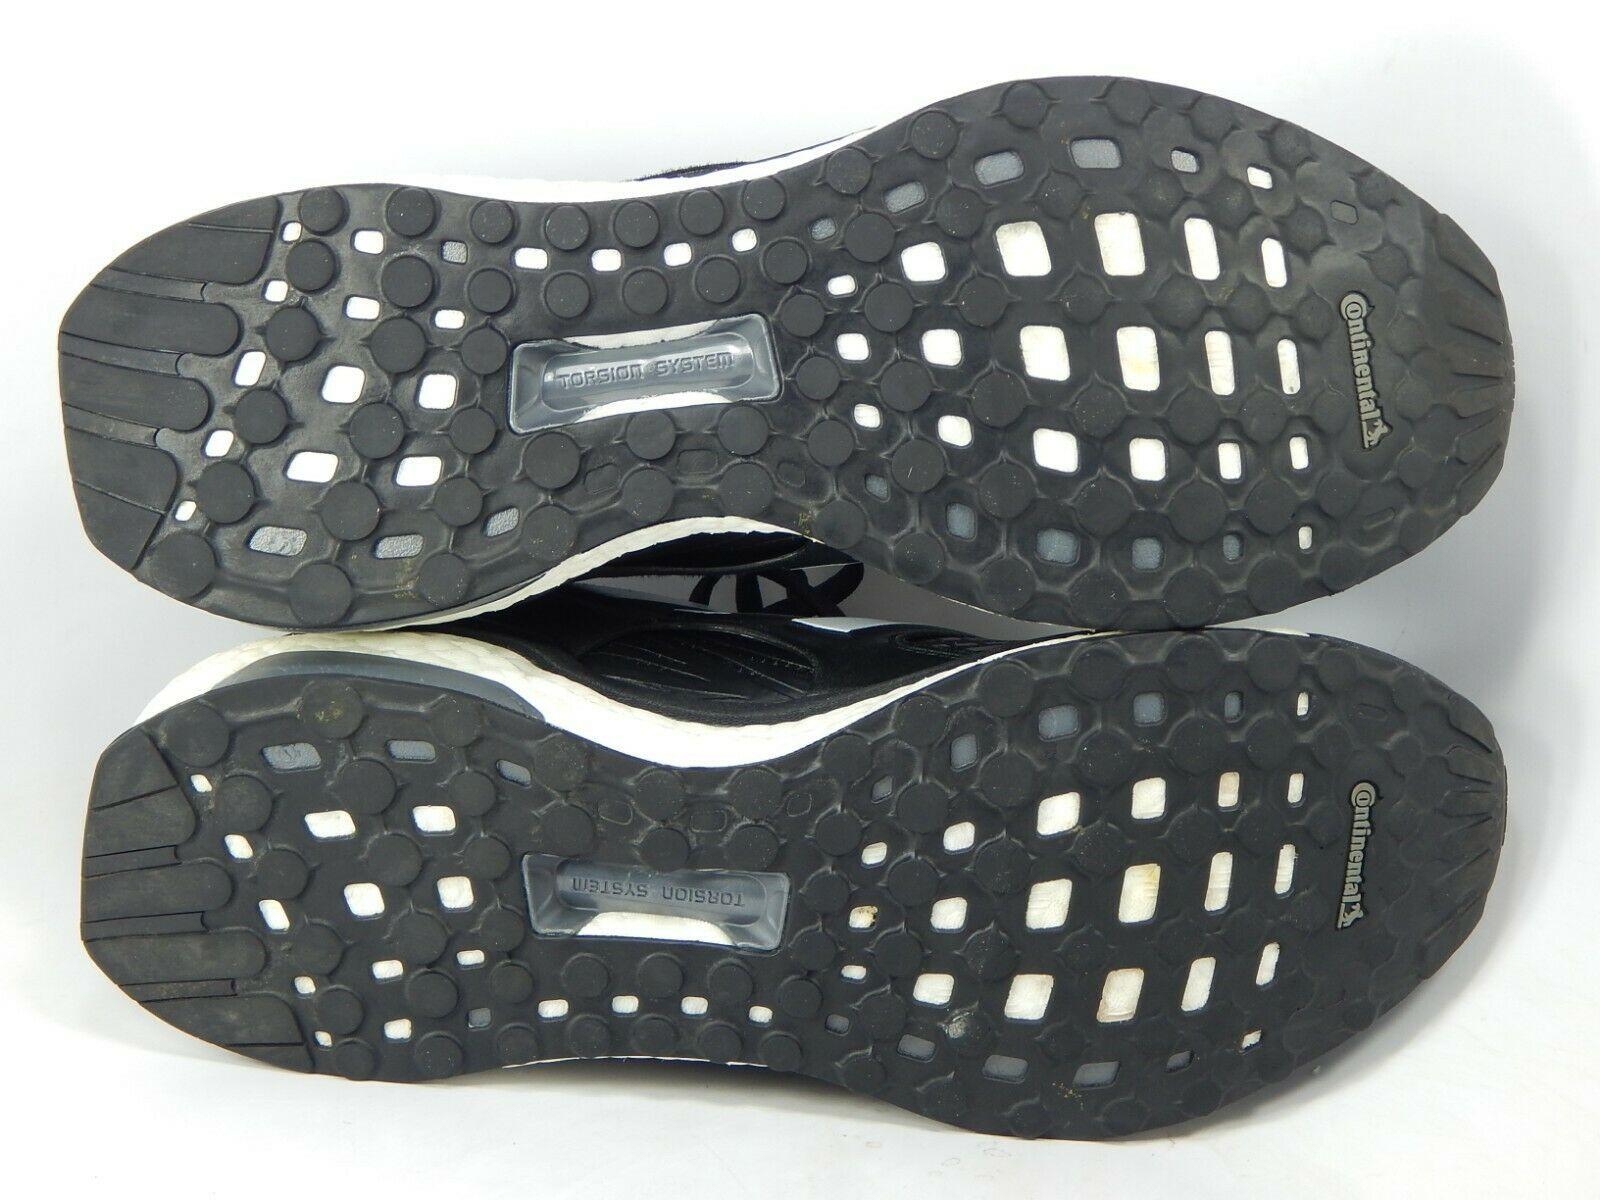 Adidas Energy Boost Misura USA 9.5 M (D) Eu 43 1/3 Uomo Scarpe da Corsa Nero image 7